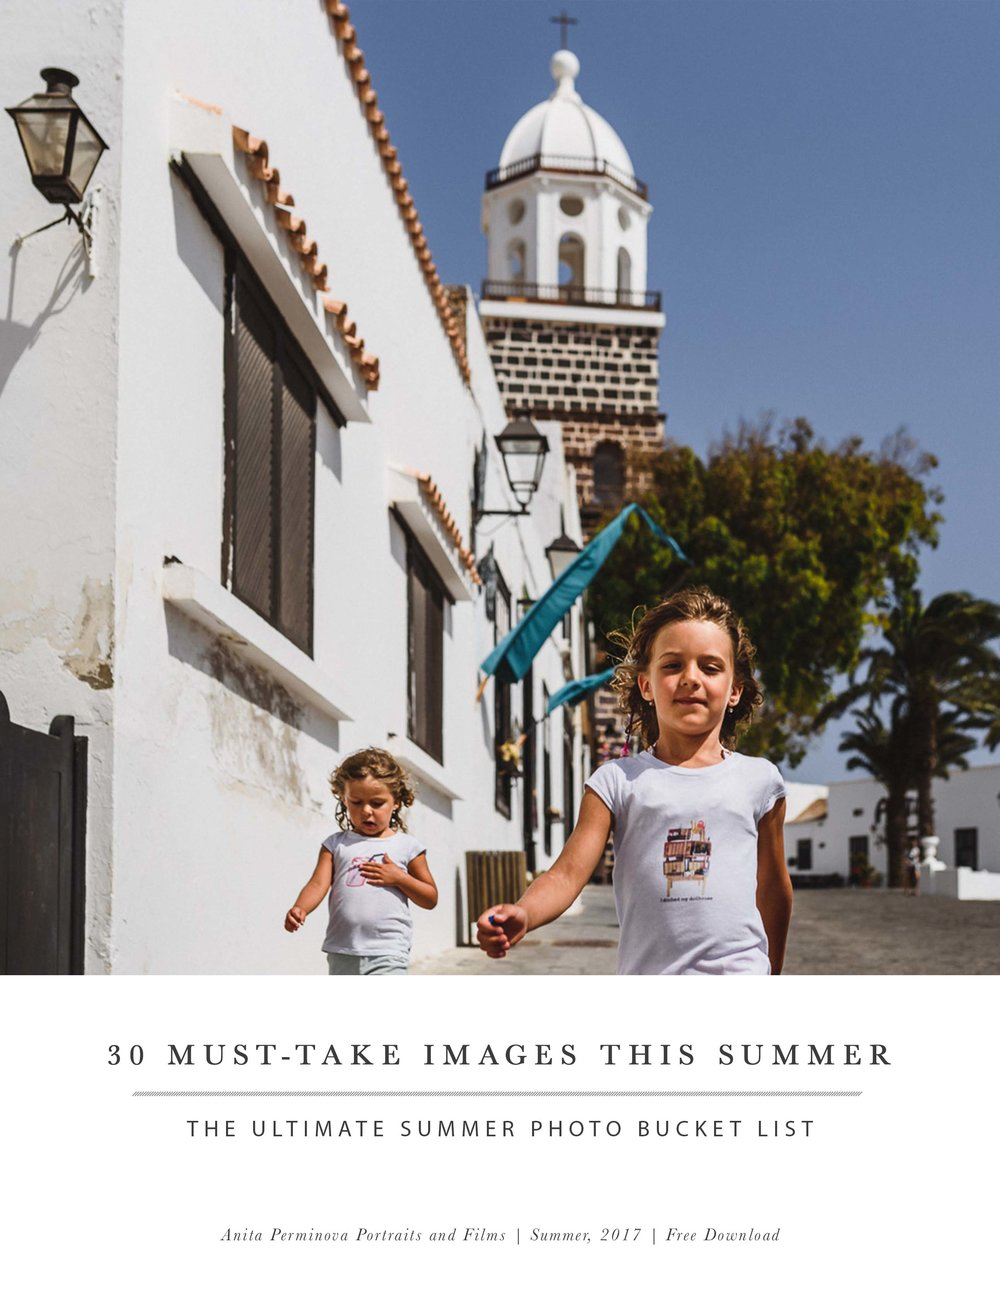 summer bucket list 2017 with anita perminova amsterdam portrait photographer and filmmaker.jpg